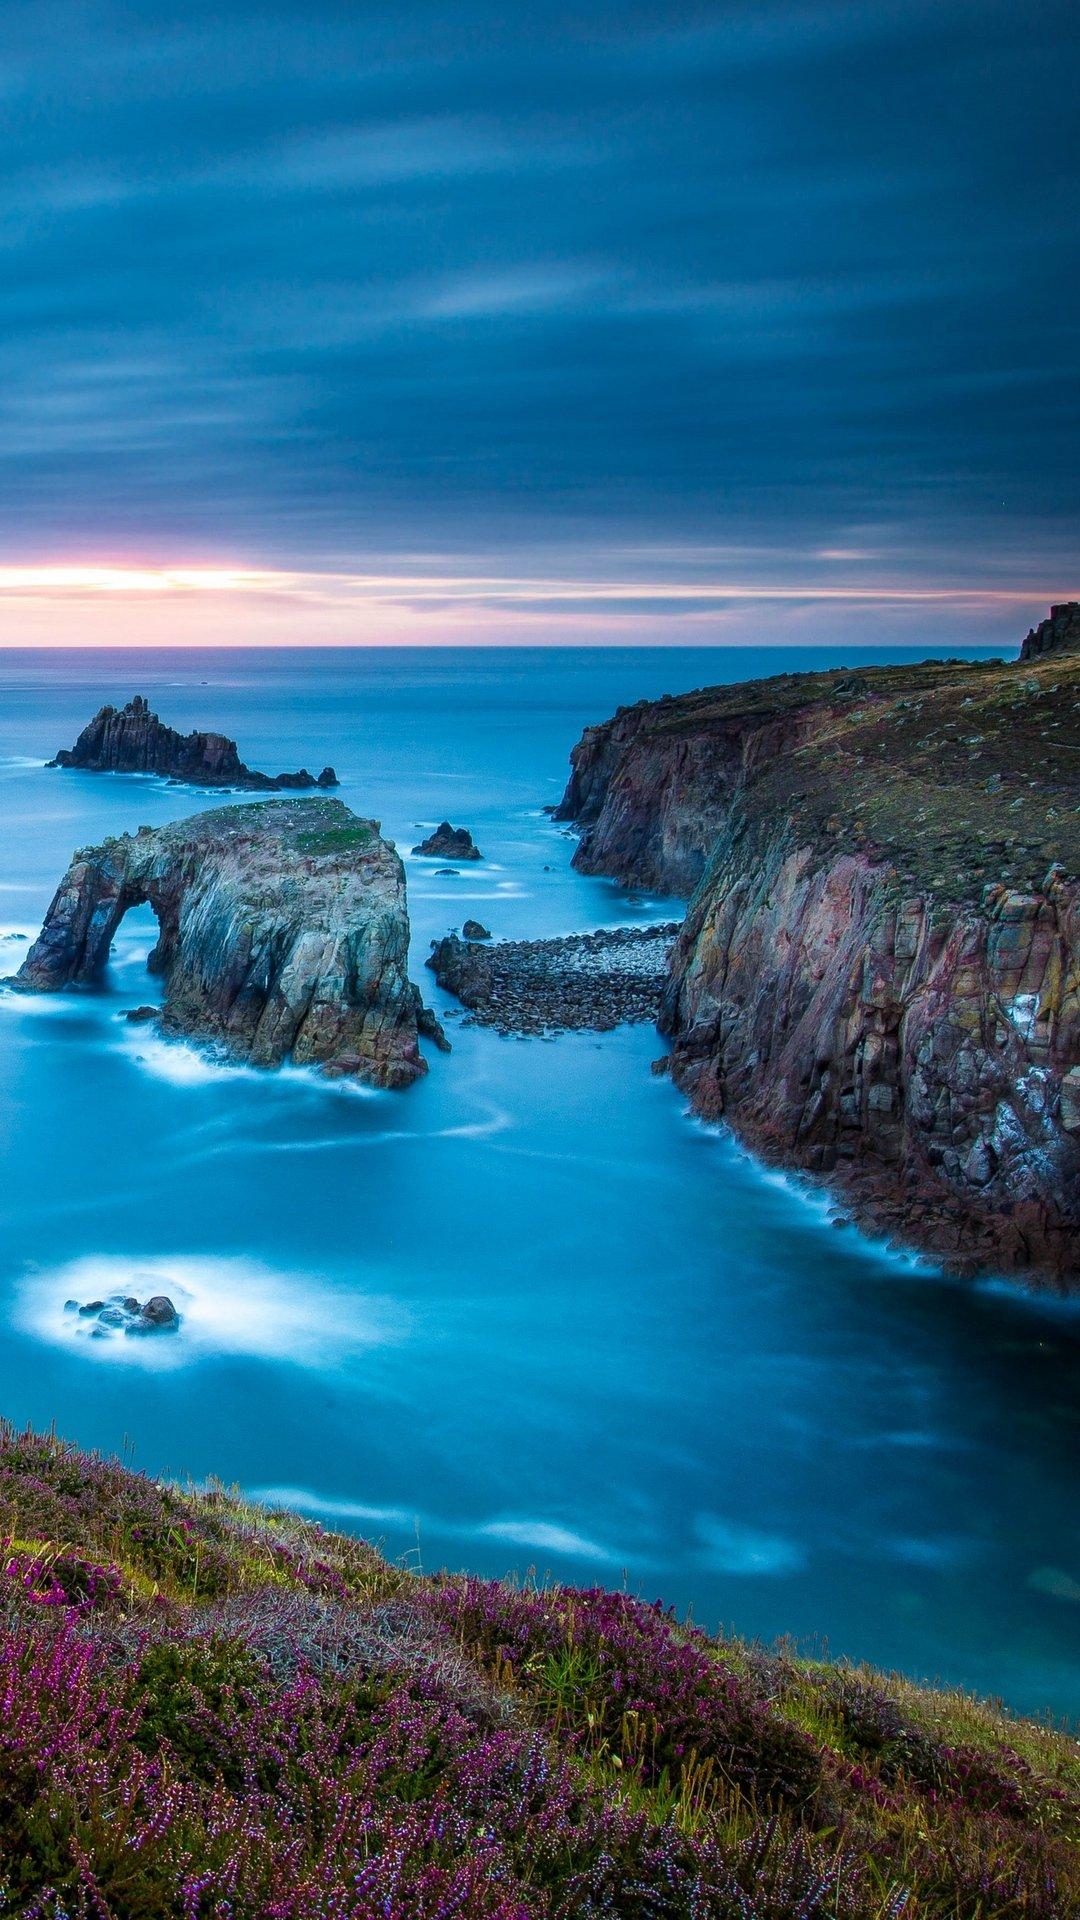 Cornwall England Celtic Sea Cape Lands Wallpaper   [1080x1920] 1080x1920